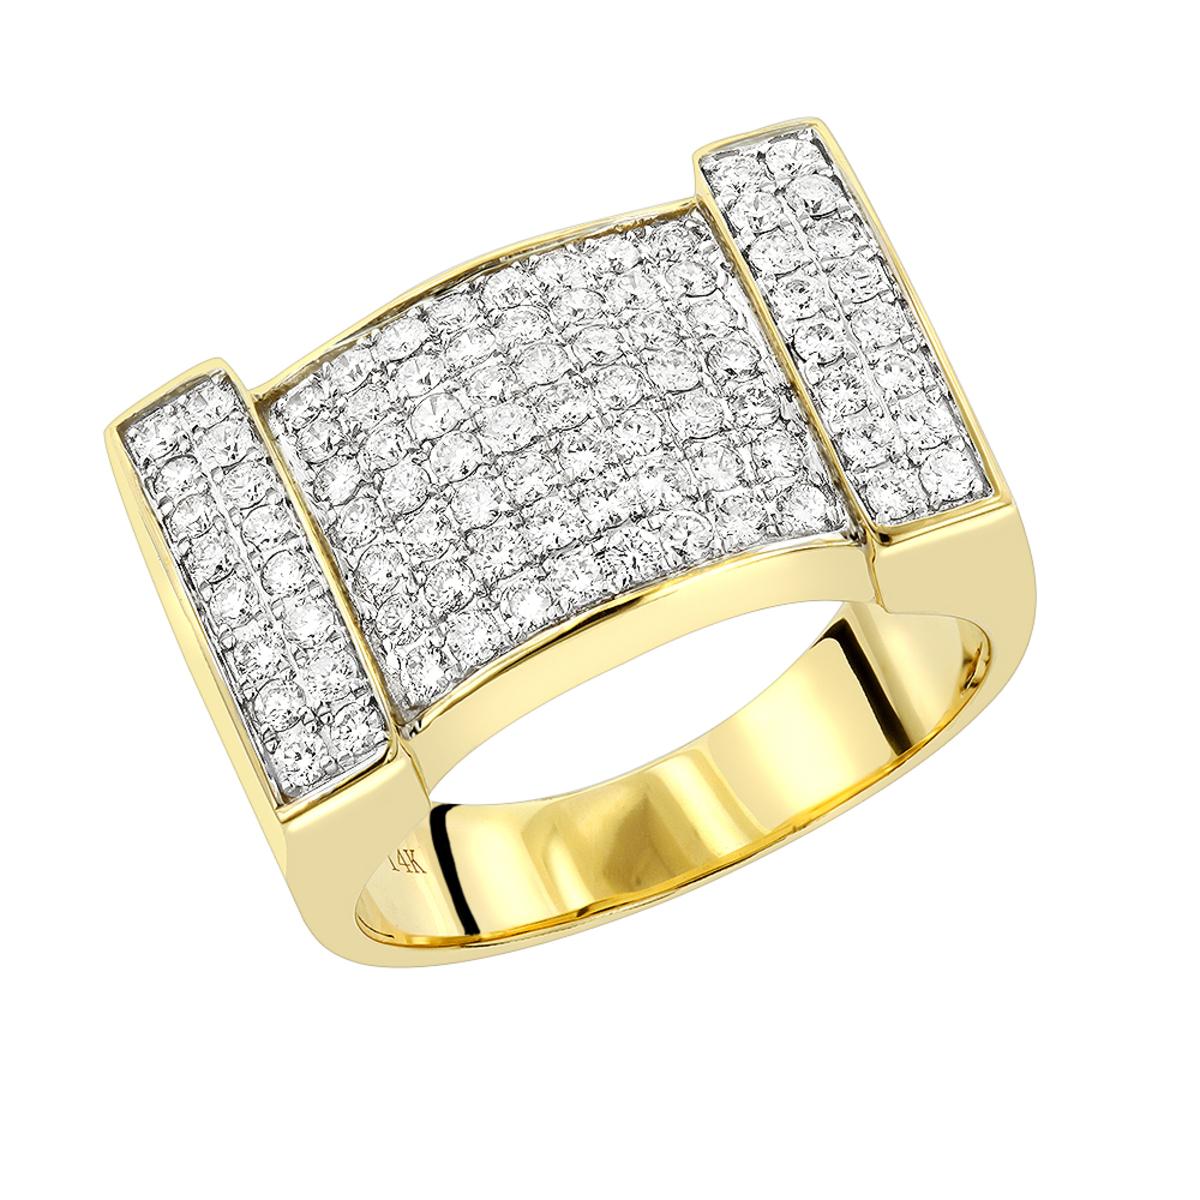 Mens Diamond Gold Ring by Luxurman 1.5ct 14K